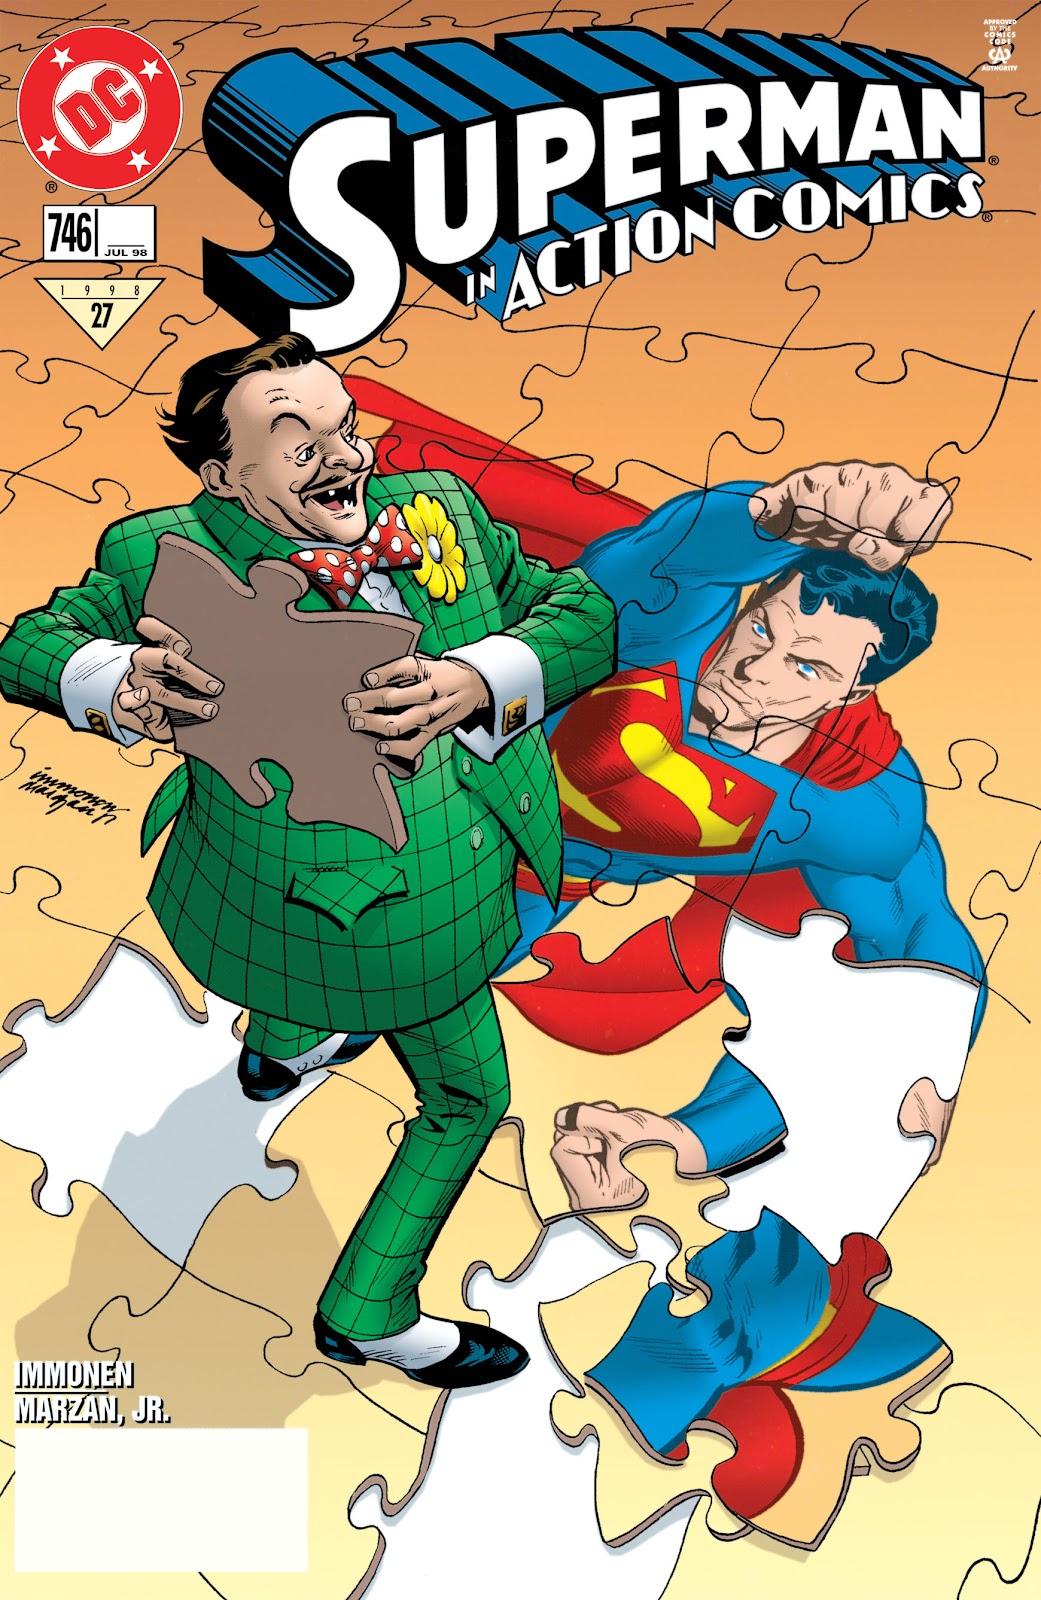 Action Comics (1938) 746 Page 1